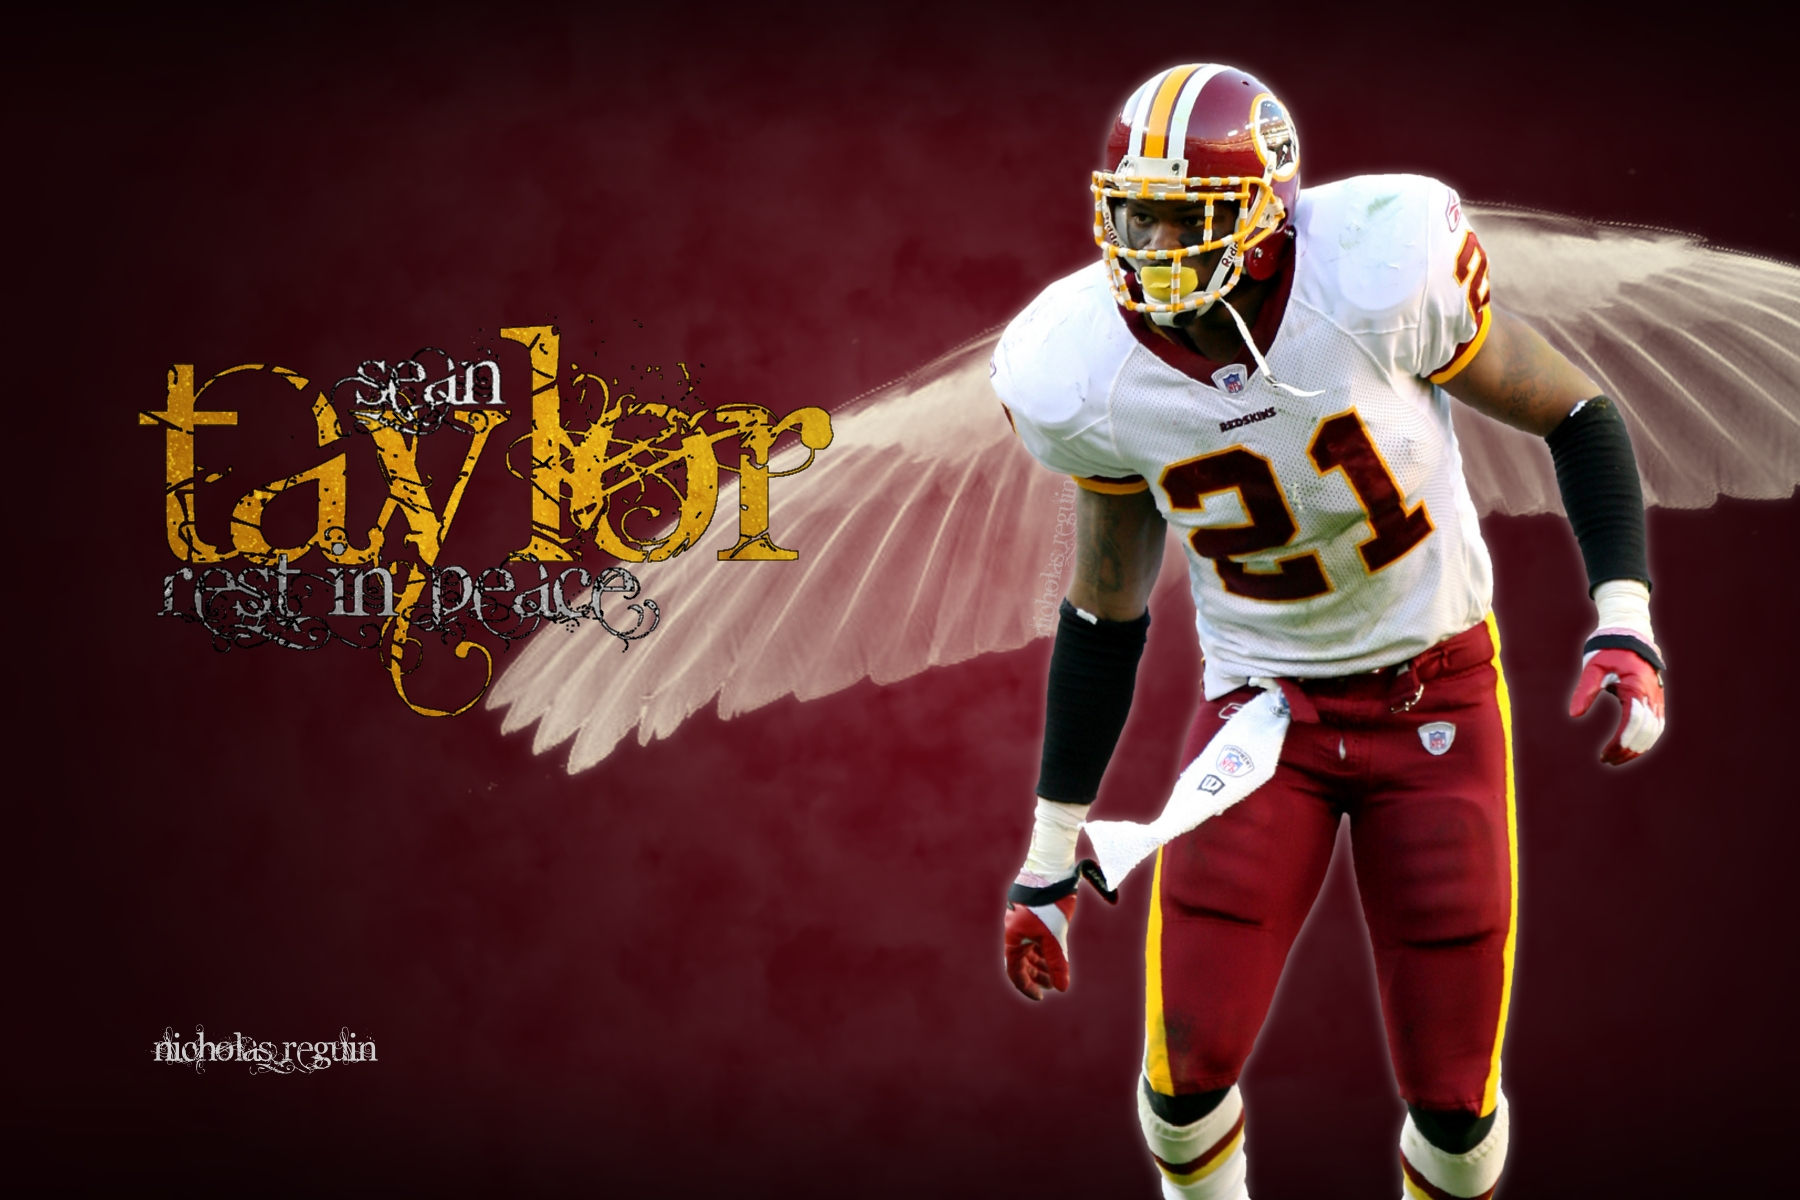 Redskins Wallpaper Sean Taylor Rest In Peace Sean Tay...